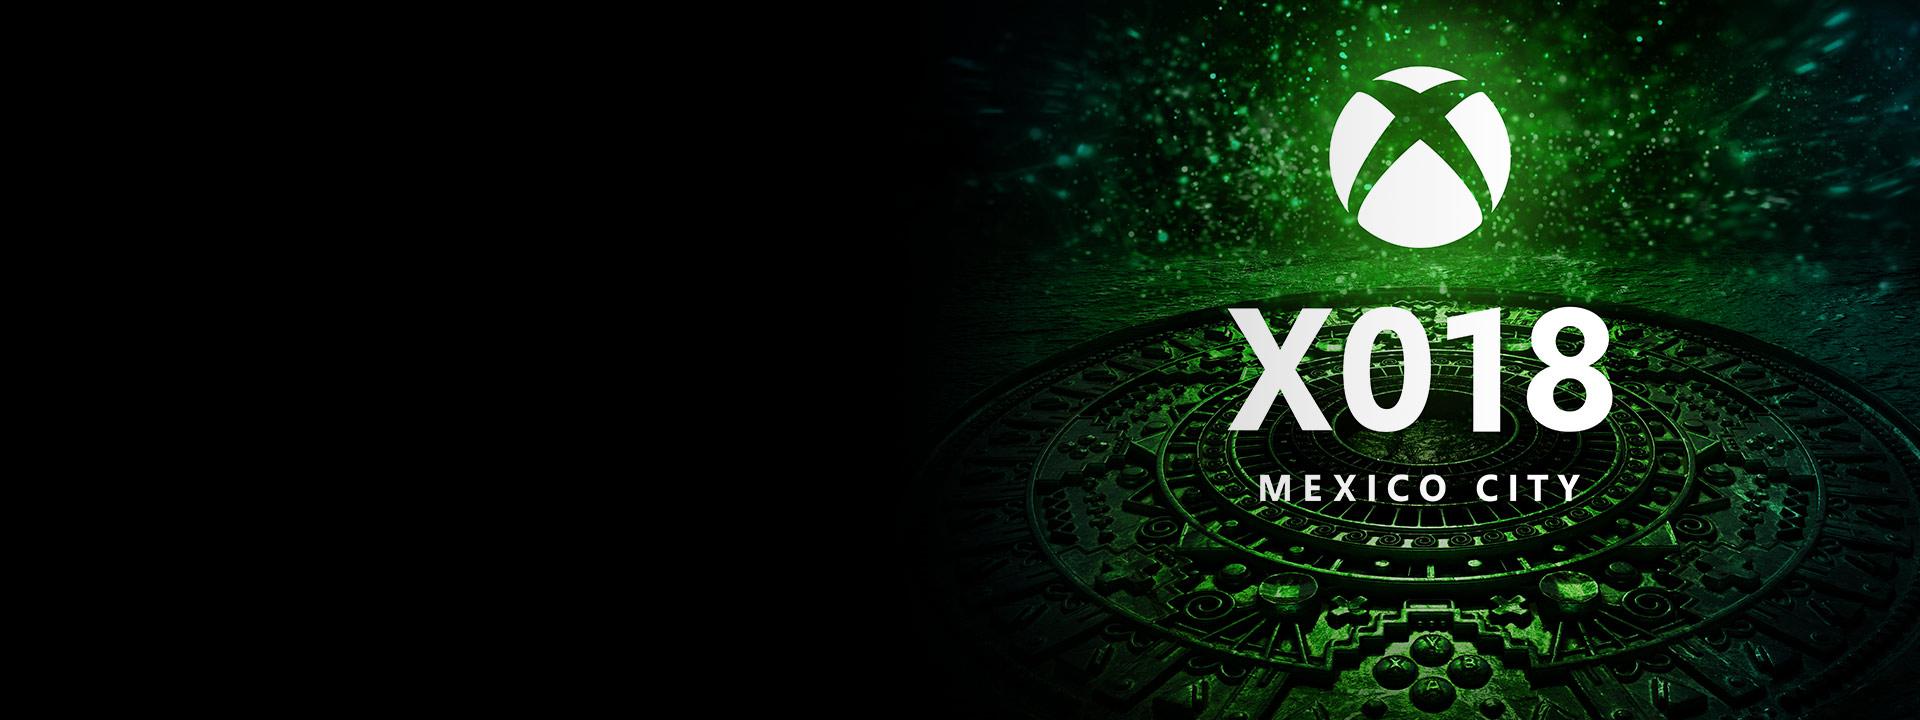 X018 墨西哥城,阿兹特克日历风格的黑色和绿色圆形以及白色圆形 Xbox 徽标。